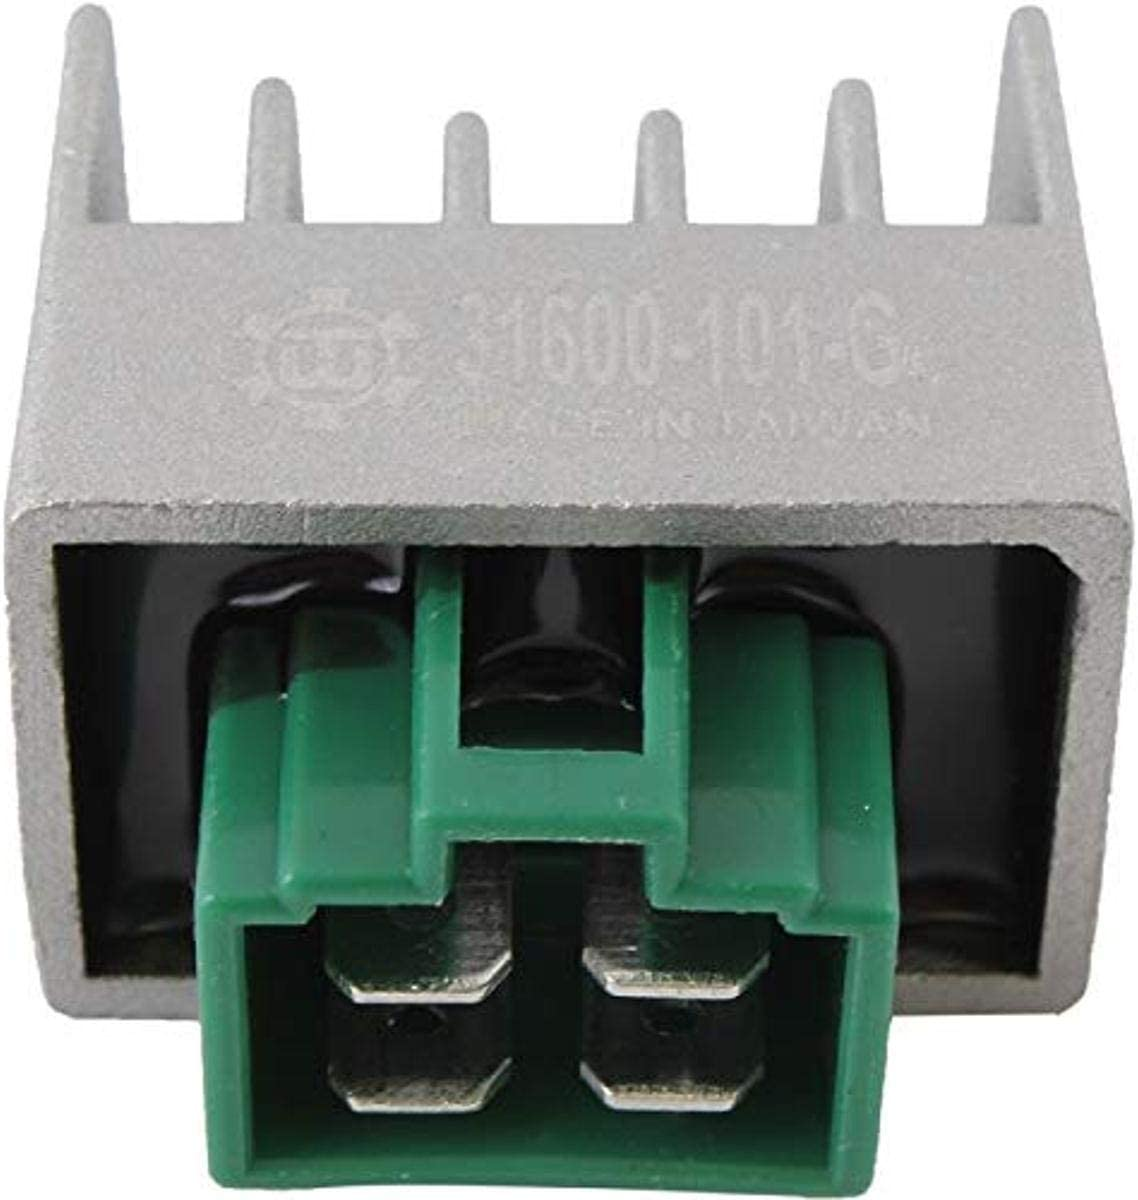 DB Electrical AYA6027 Voltage Regulator Compatible With//Replacement For Yamaha RT180 TT90 125E TTR230 TTR90 TTR90E Razz SH50 AP8224102 ESP10054 2728107000 31600-KRM-851 21066-0029 21066-0046 SH681-12